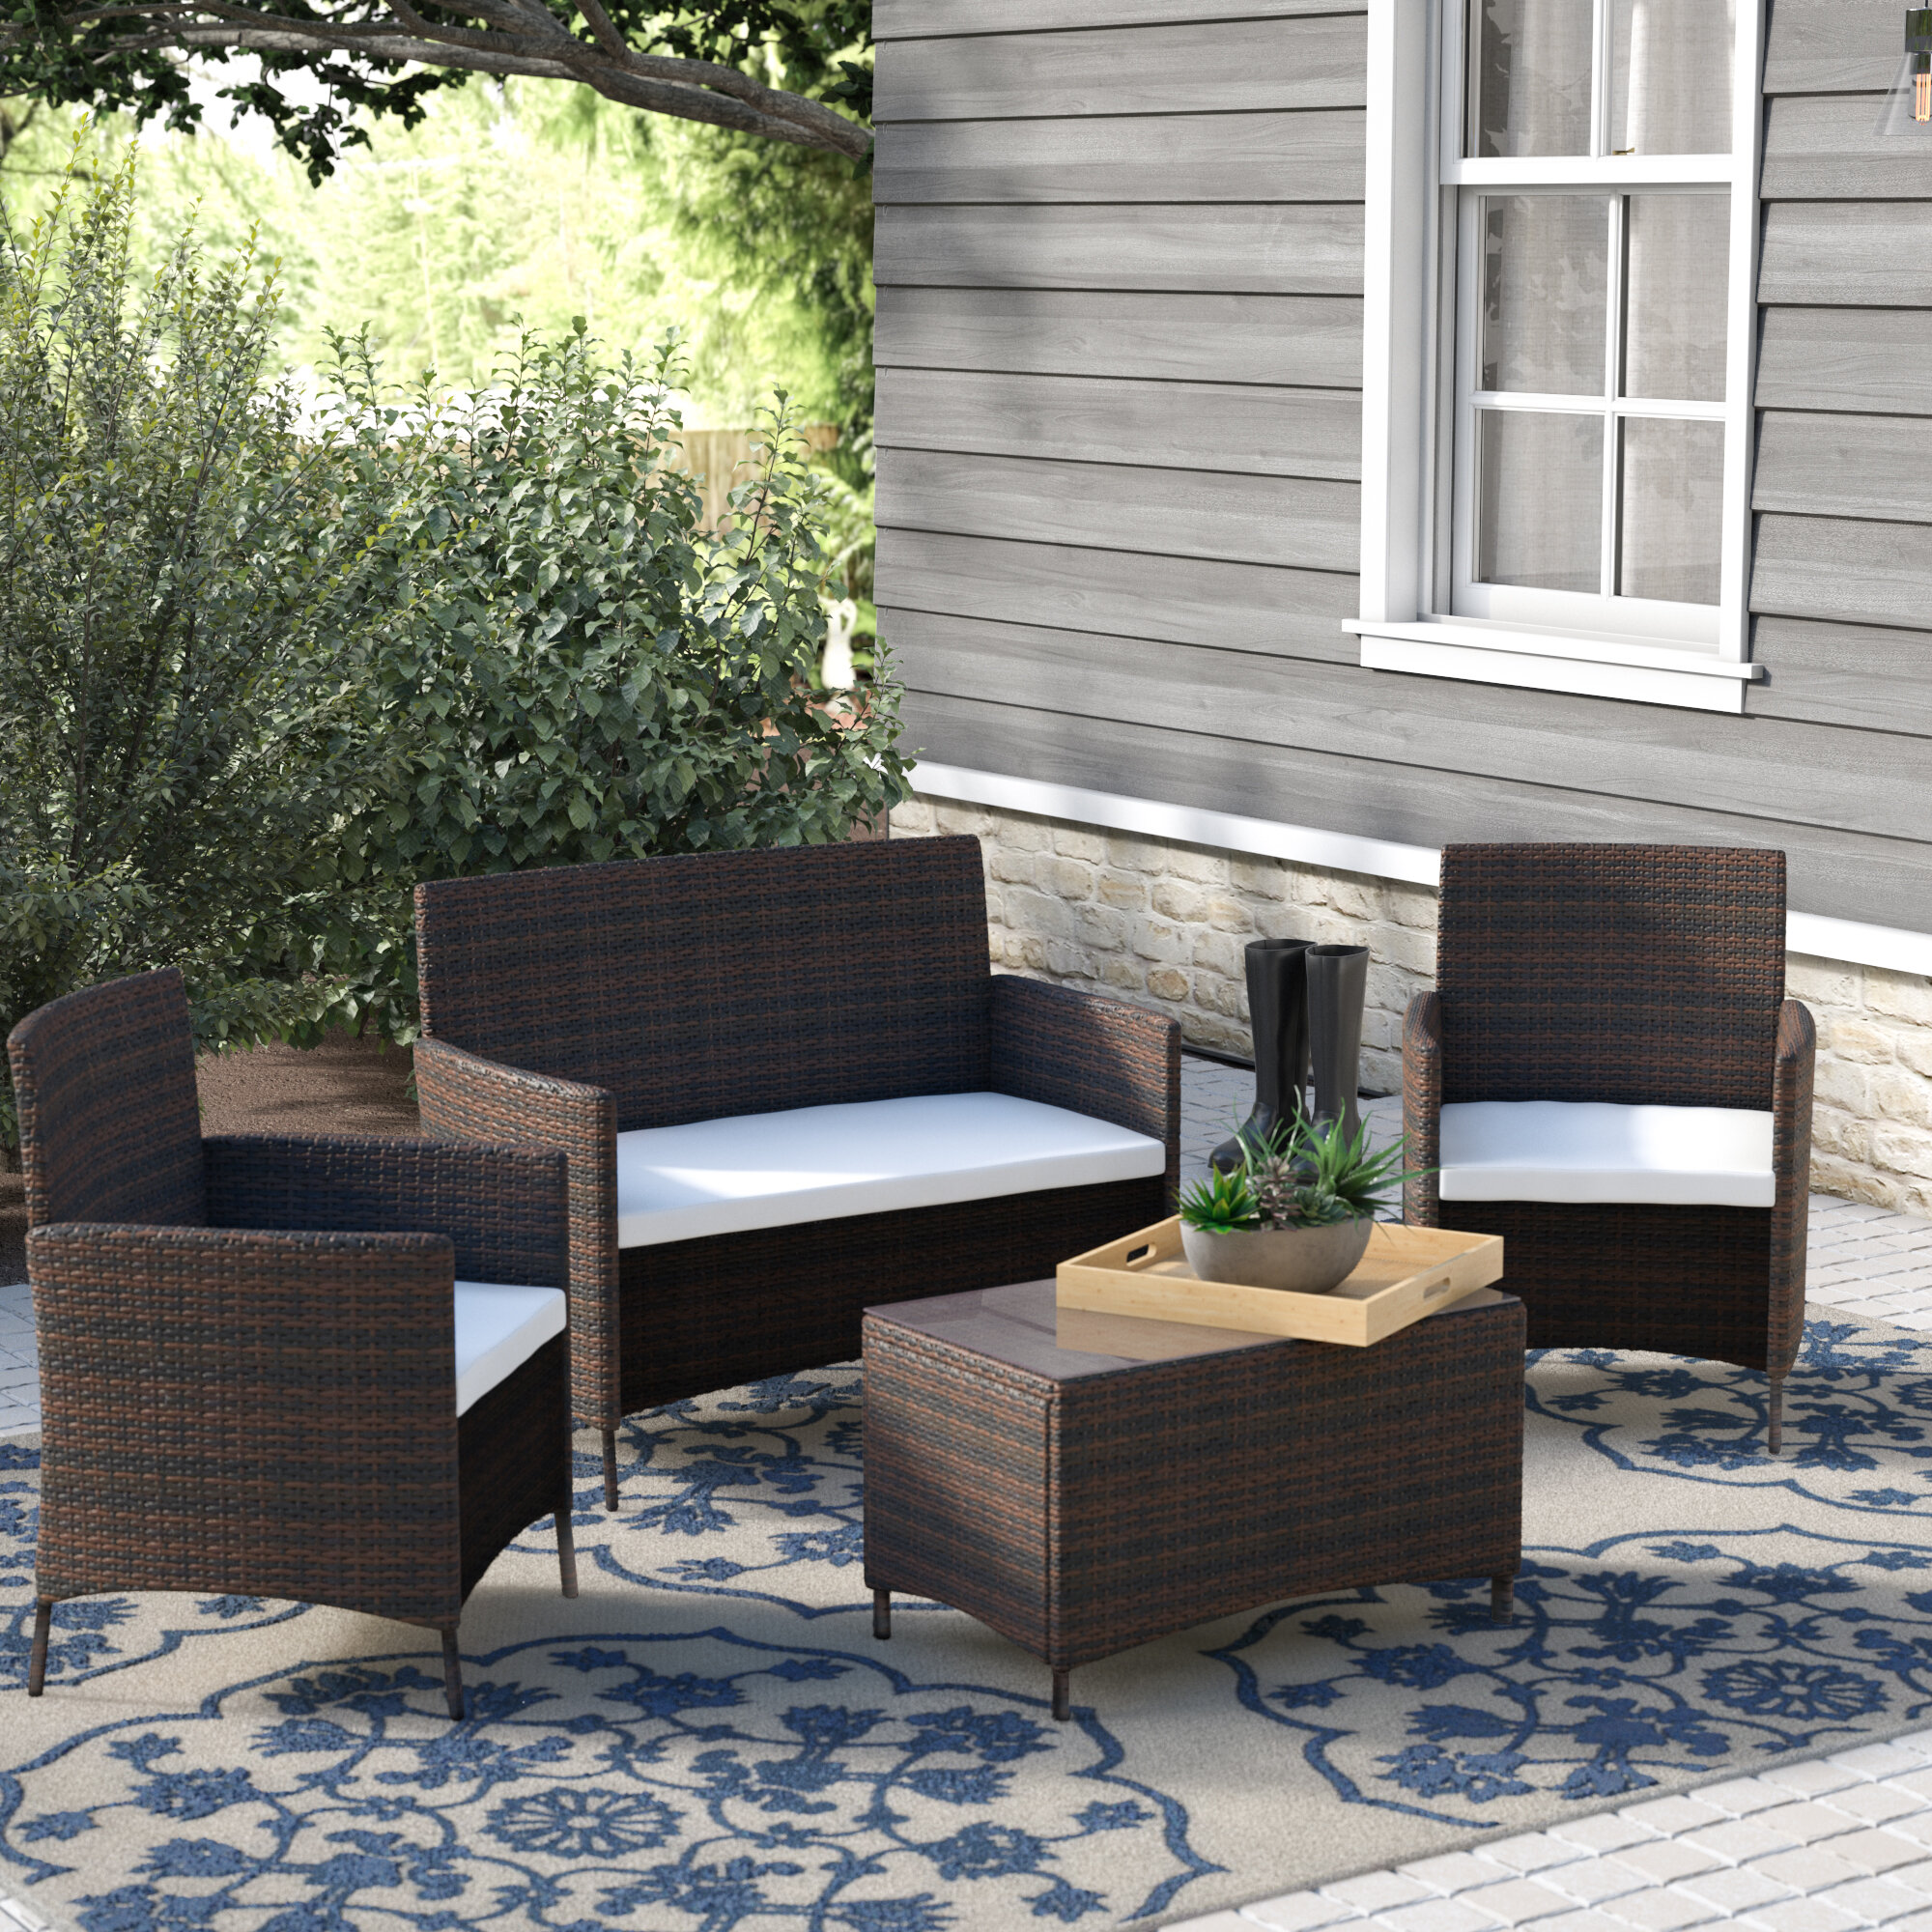 Merax 4 Piece Rattan Deep Sofa Seating Group With Cushion Reviews Wayfair